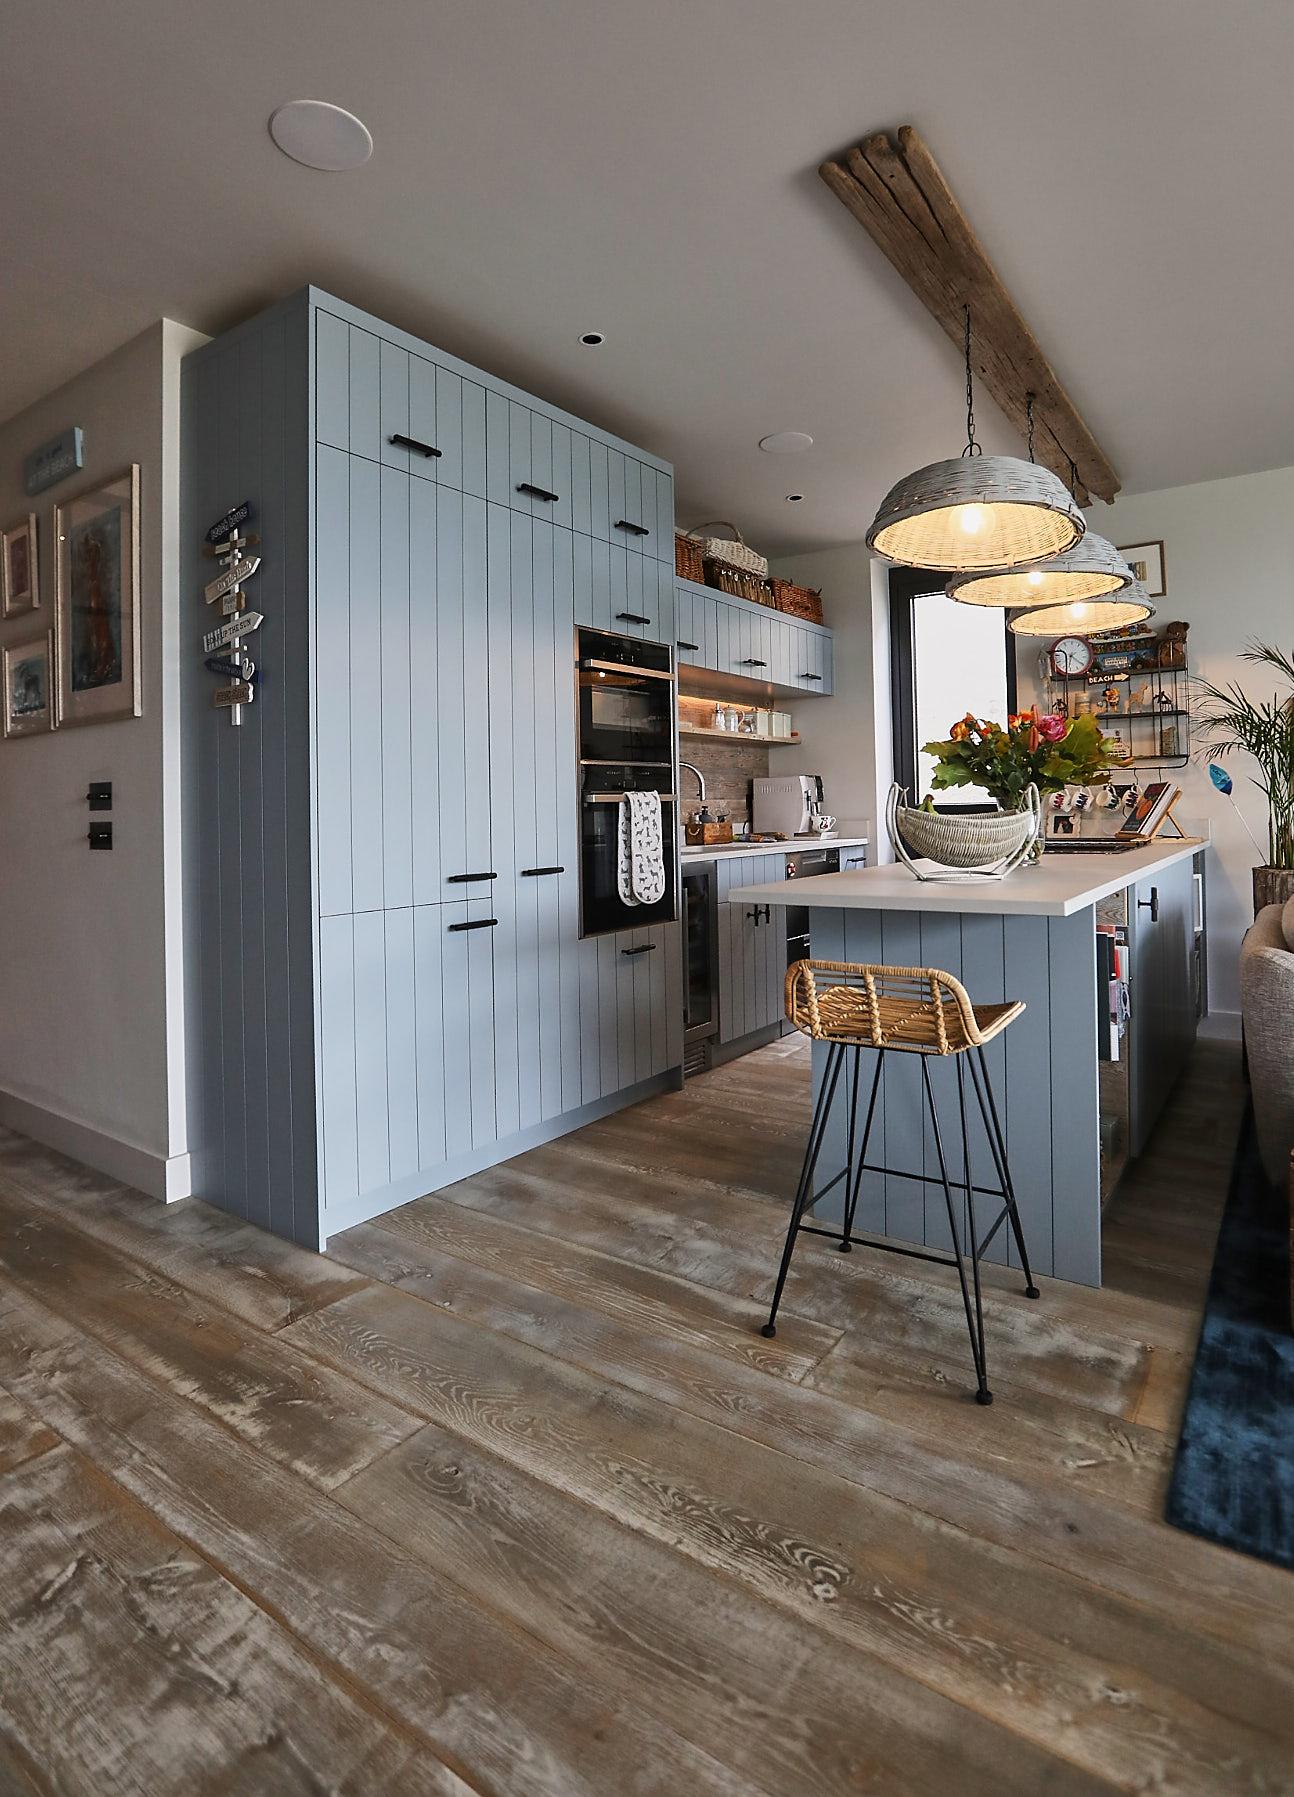 Baby blue bespoke kitchen with wooden flooring